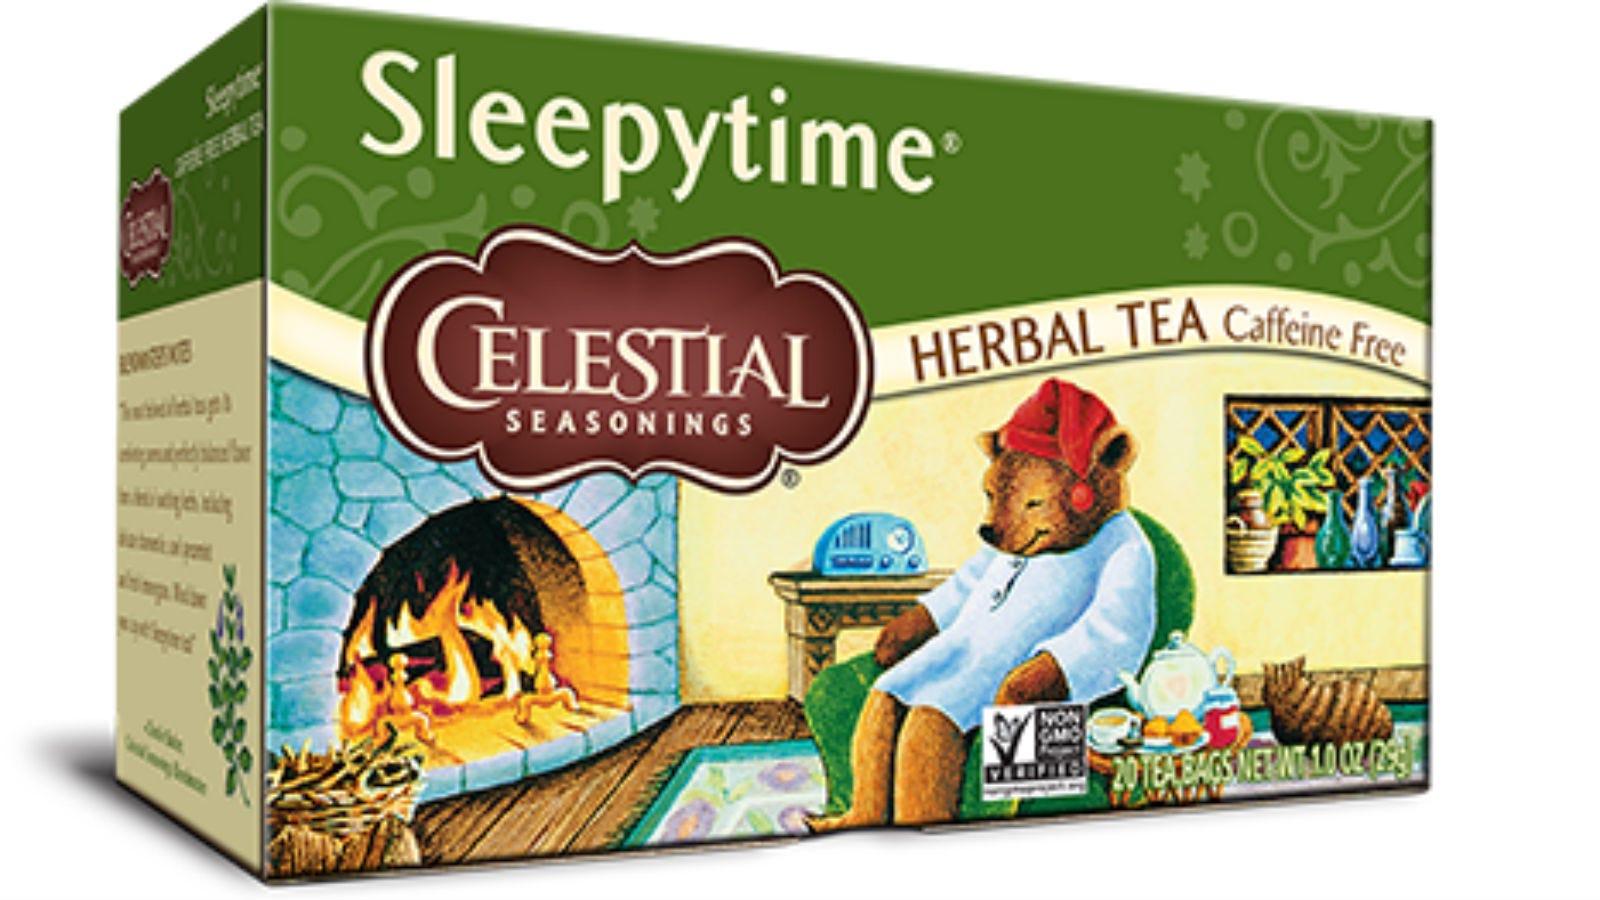 A box of Celestial Seasonings Sleepytime Tea.